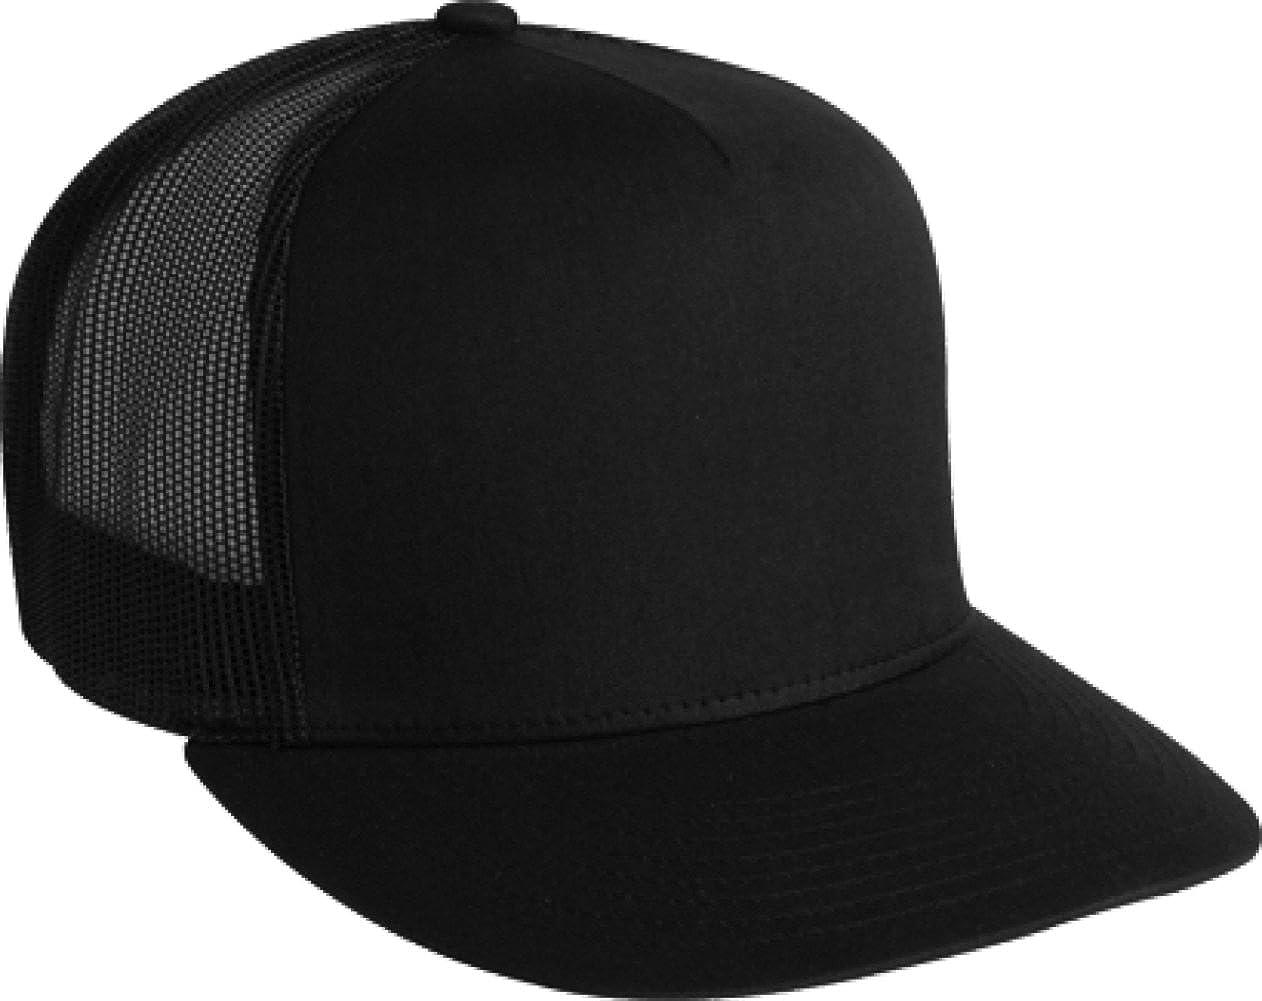 934aed46a712c Amazon.com  Adjustable Snapback Classic Trucker Hat by FlexFit  6006  (Black)  Clothing